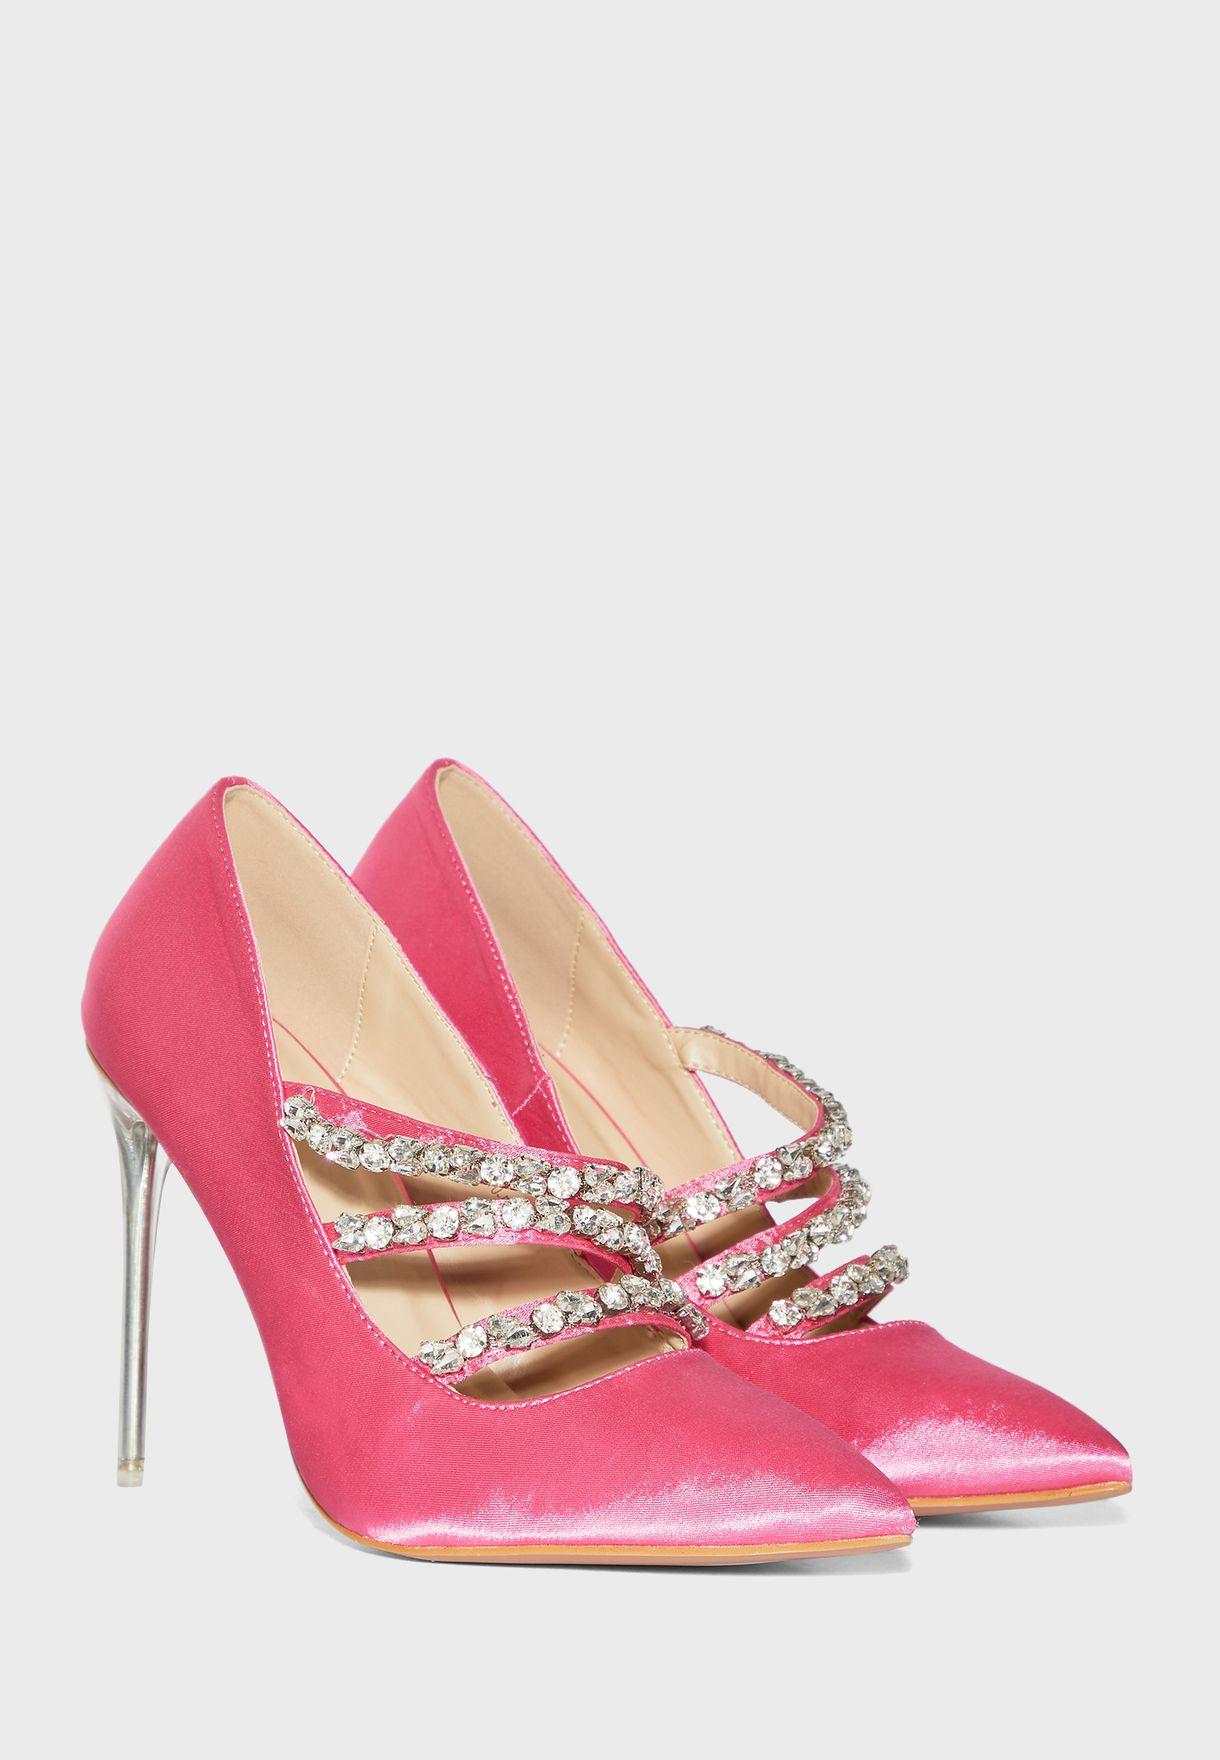 حذاء مرصع ذو كعب عالي